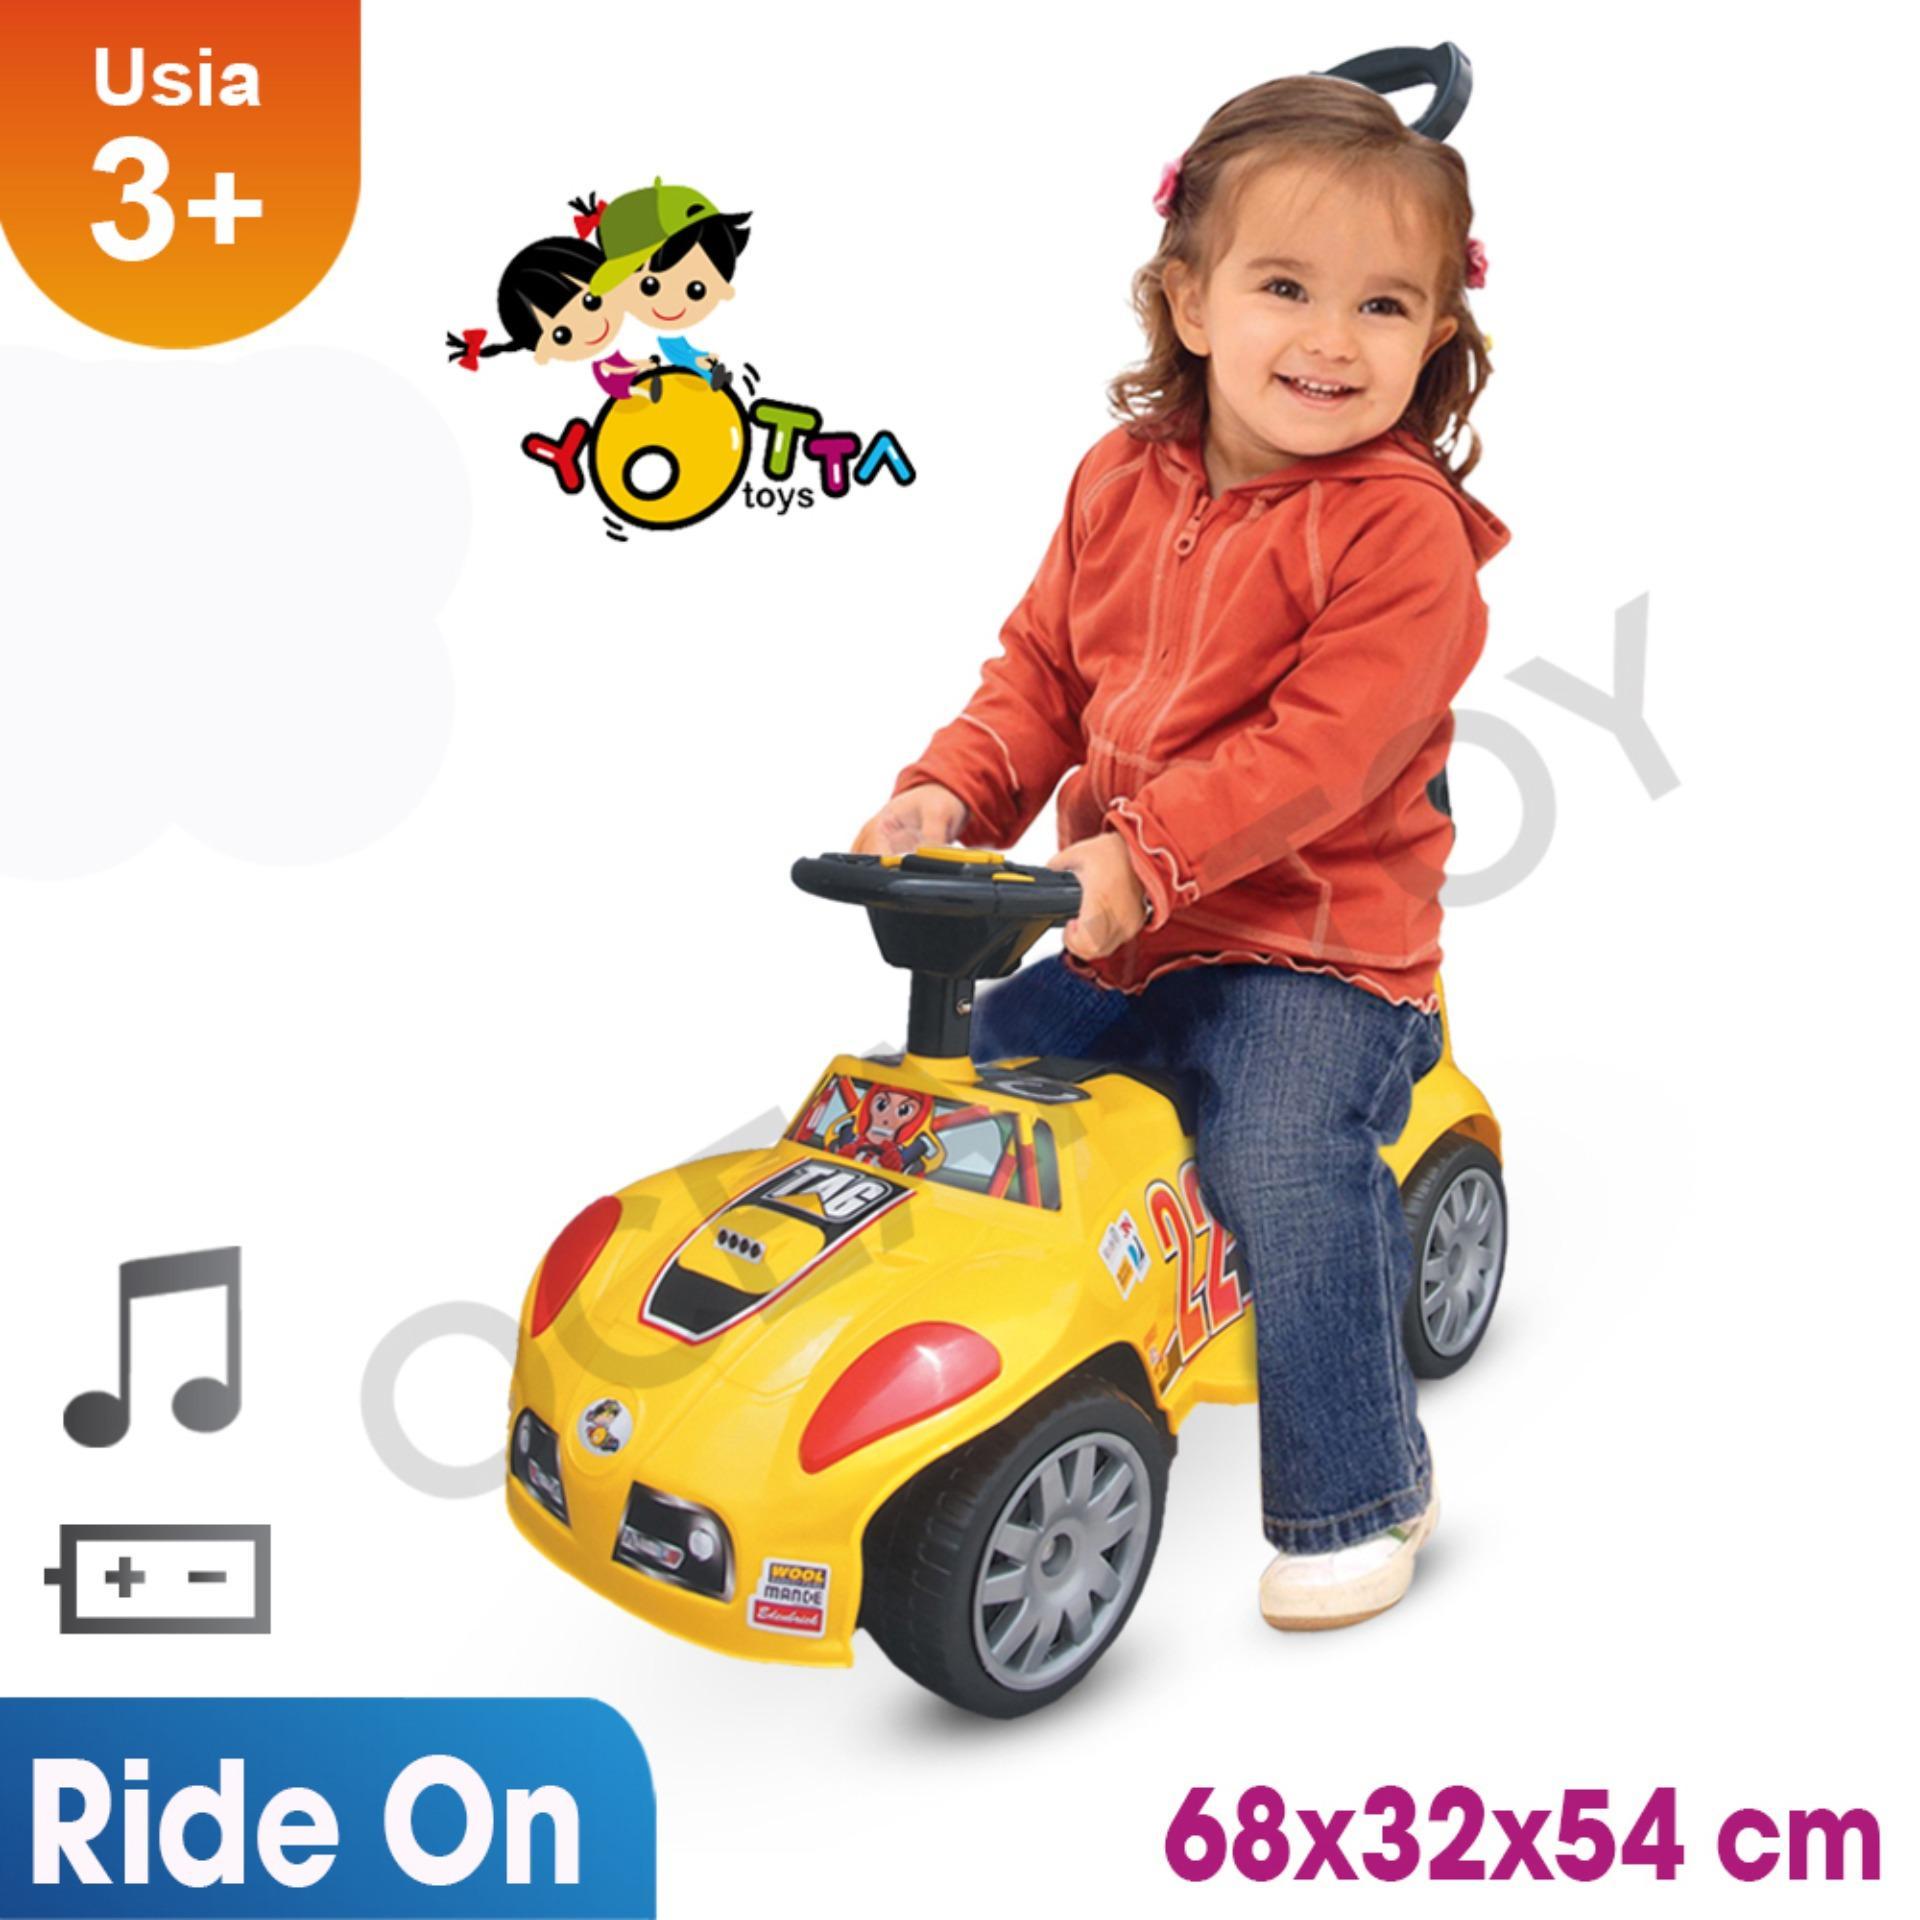 Ride On Mobil / Khusus Jabodetabek / Ride On Mobil Pembalap / Anak Laki / Anak Perempuan / Mpb By Ocean Toy.